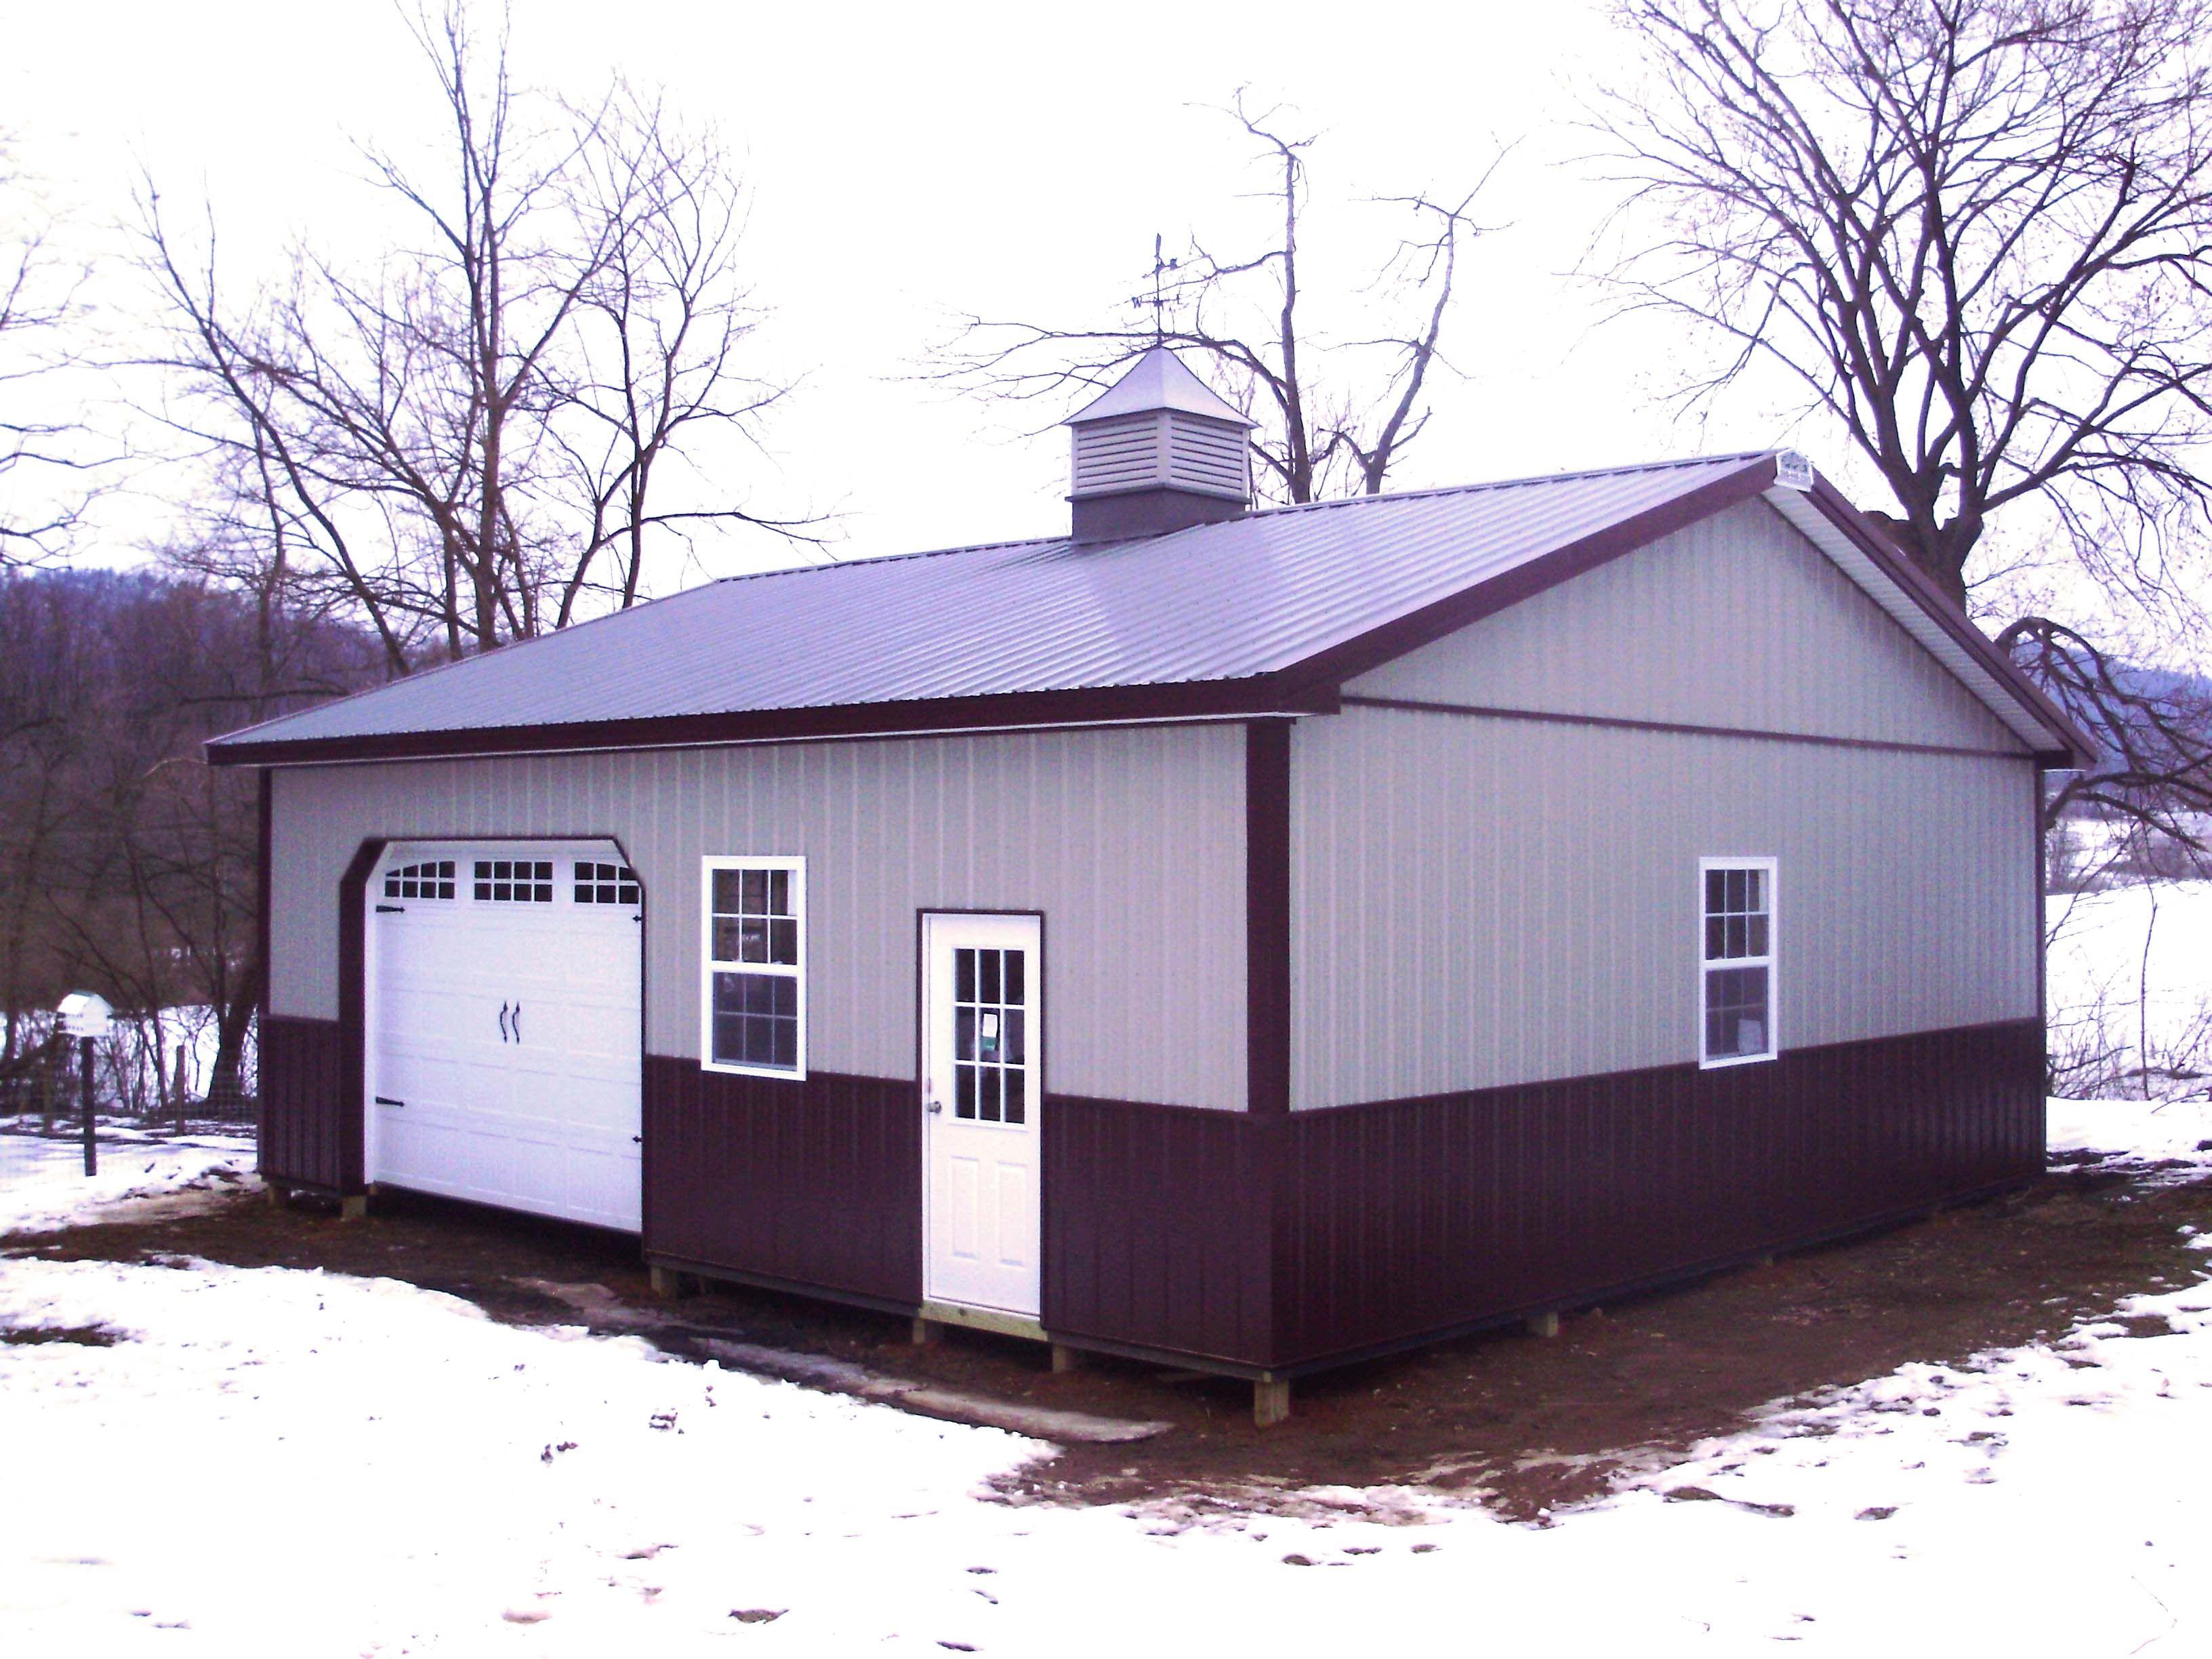 Building dimensions 30 w x 32 l x 10 4 h id 309 for Pole barn dimensions